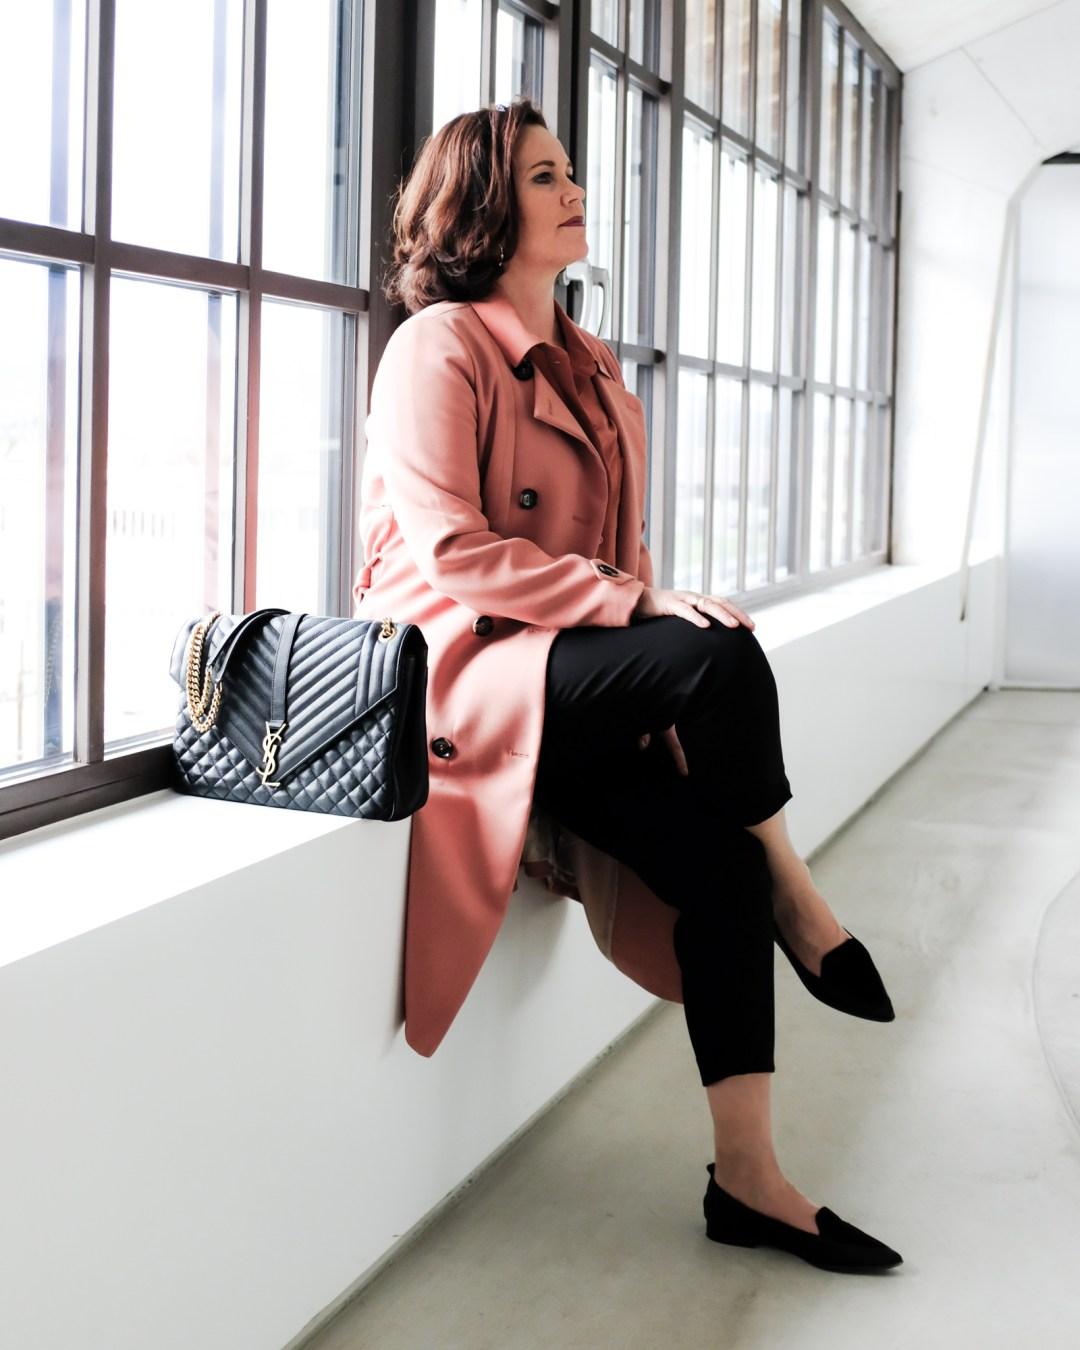 inastil, Trenchcoat, Springcoat, Frühjahrsmode, Stilberatung, Ü50Mode, Modeberatung, Frühlingsfarben, Modeblogger-2